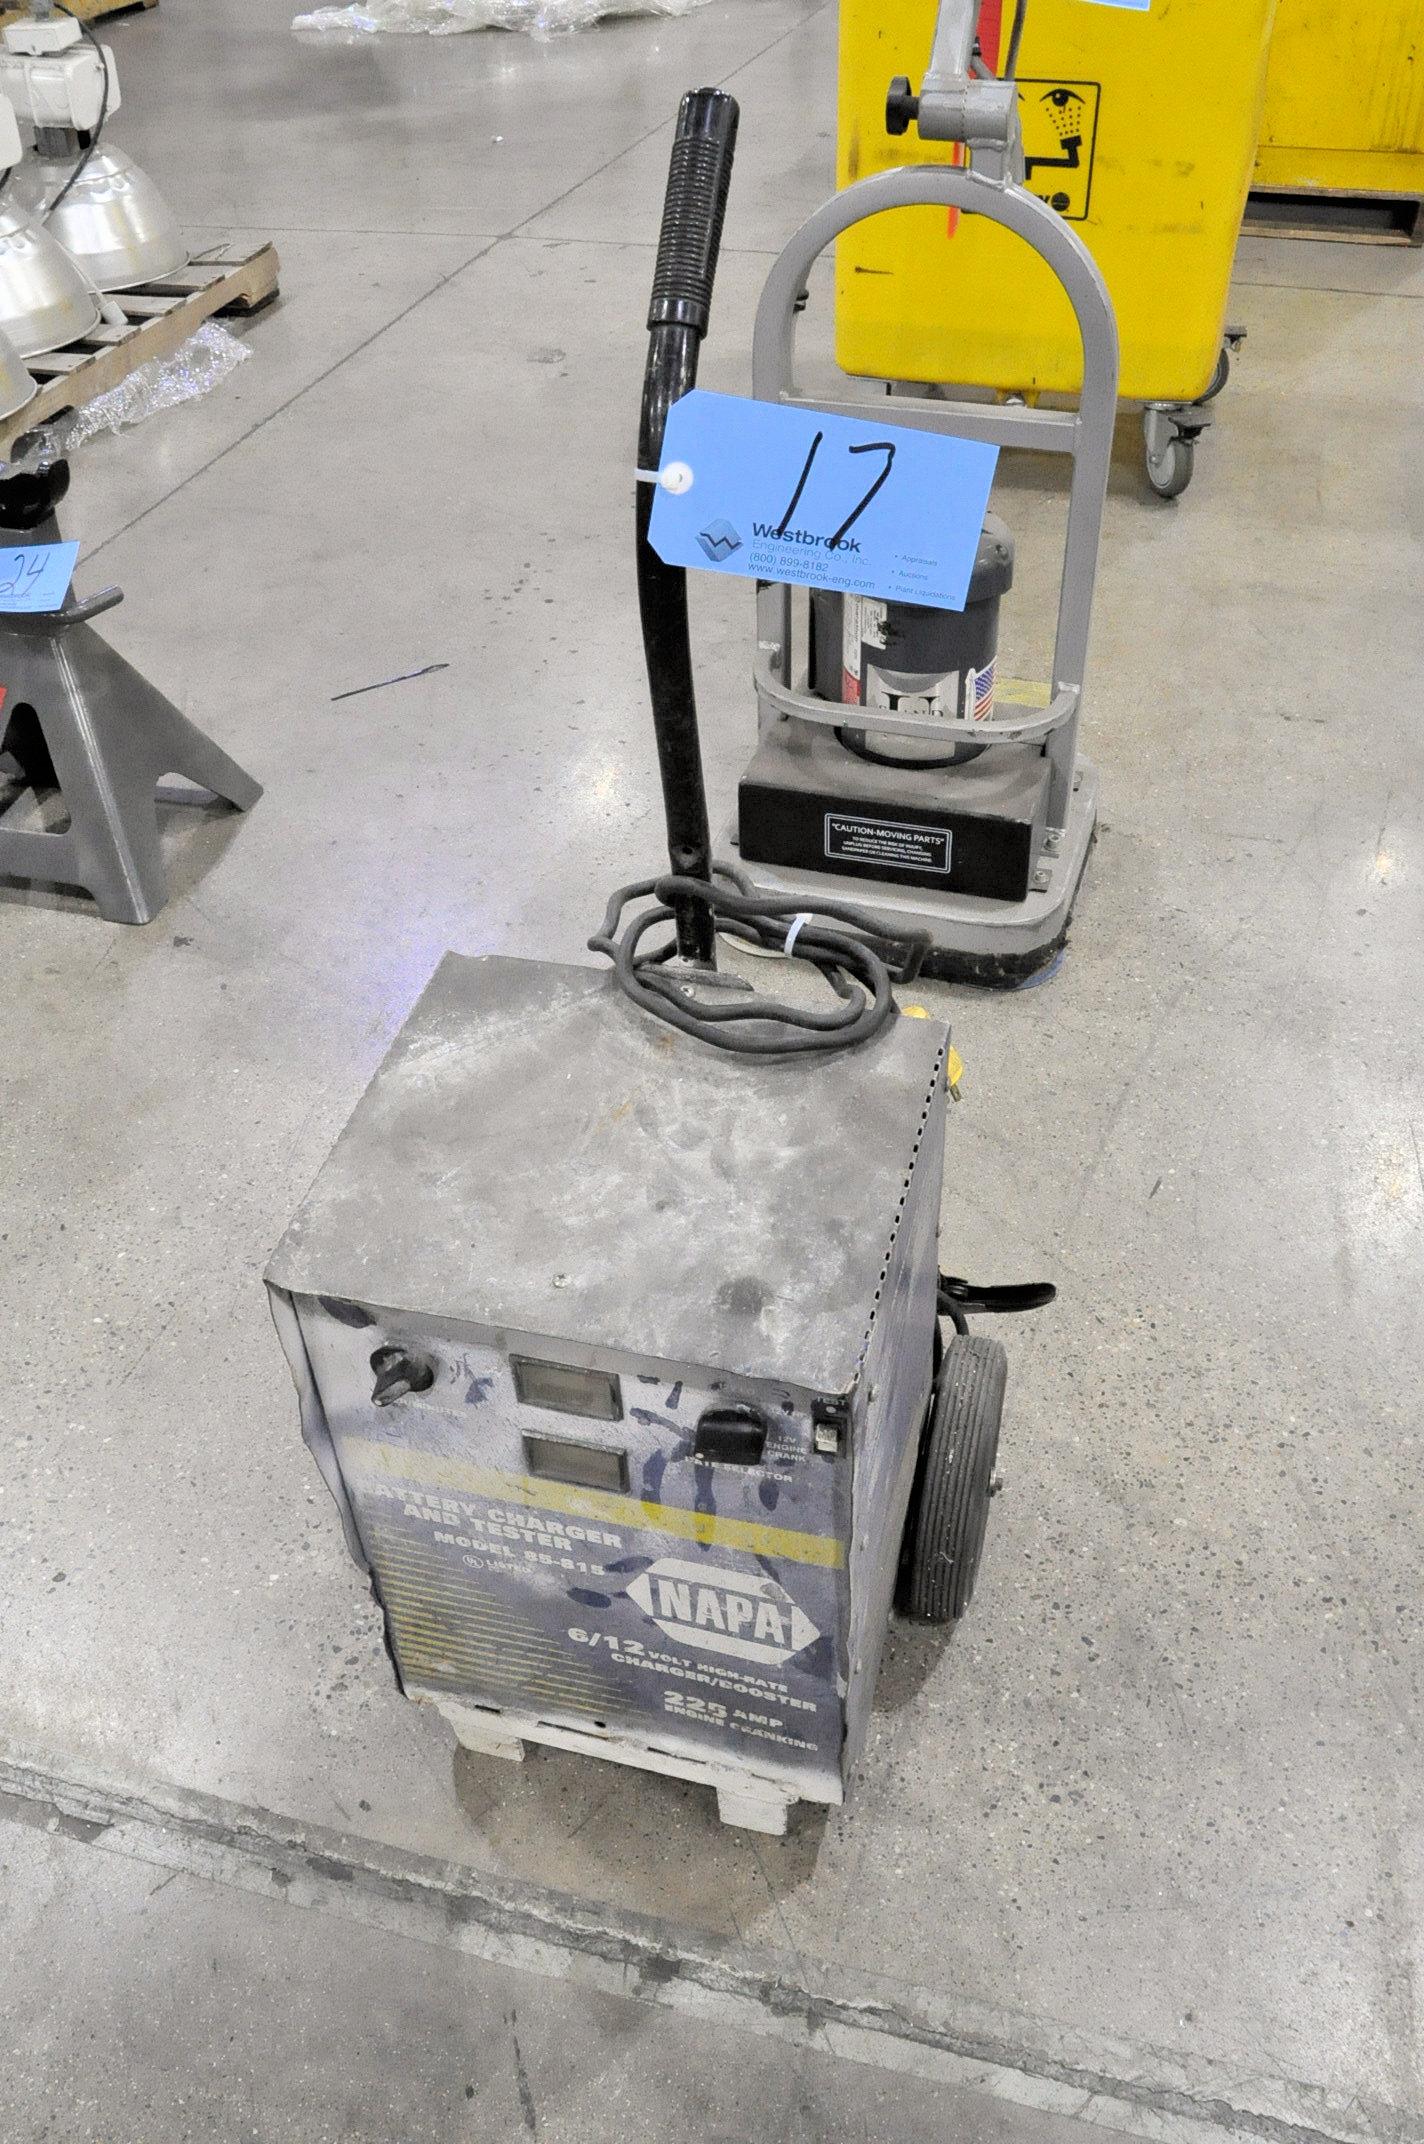 Napa Model 85-815, 225-Amp Capacity 6/12-Volt Portable Battery Charger